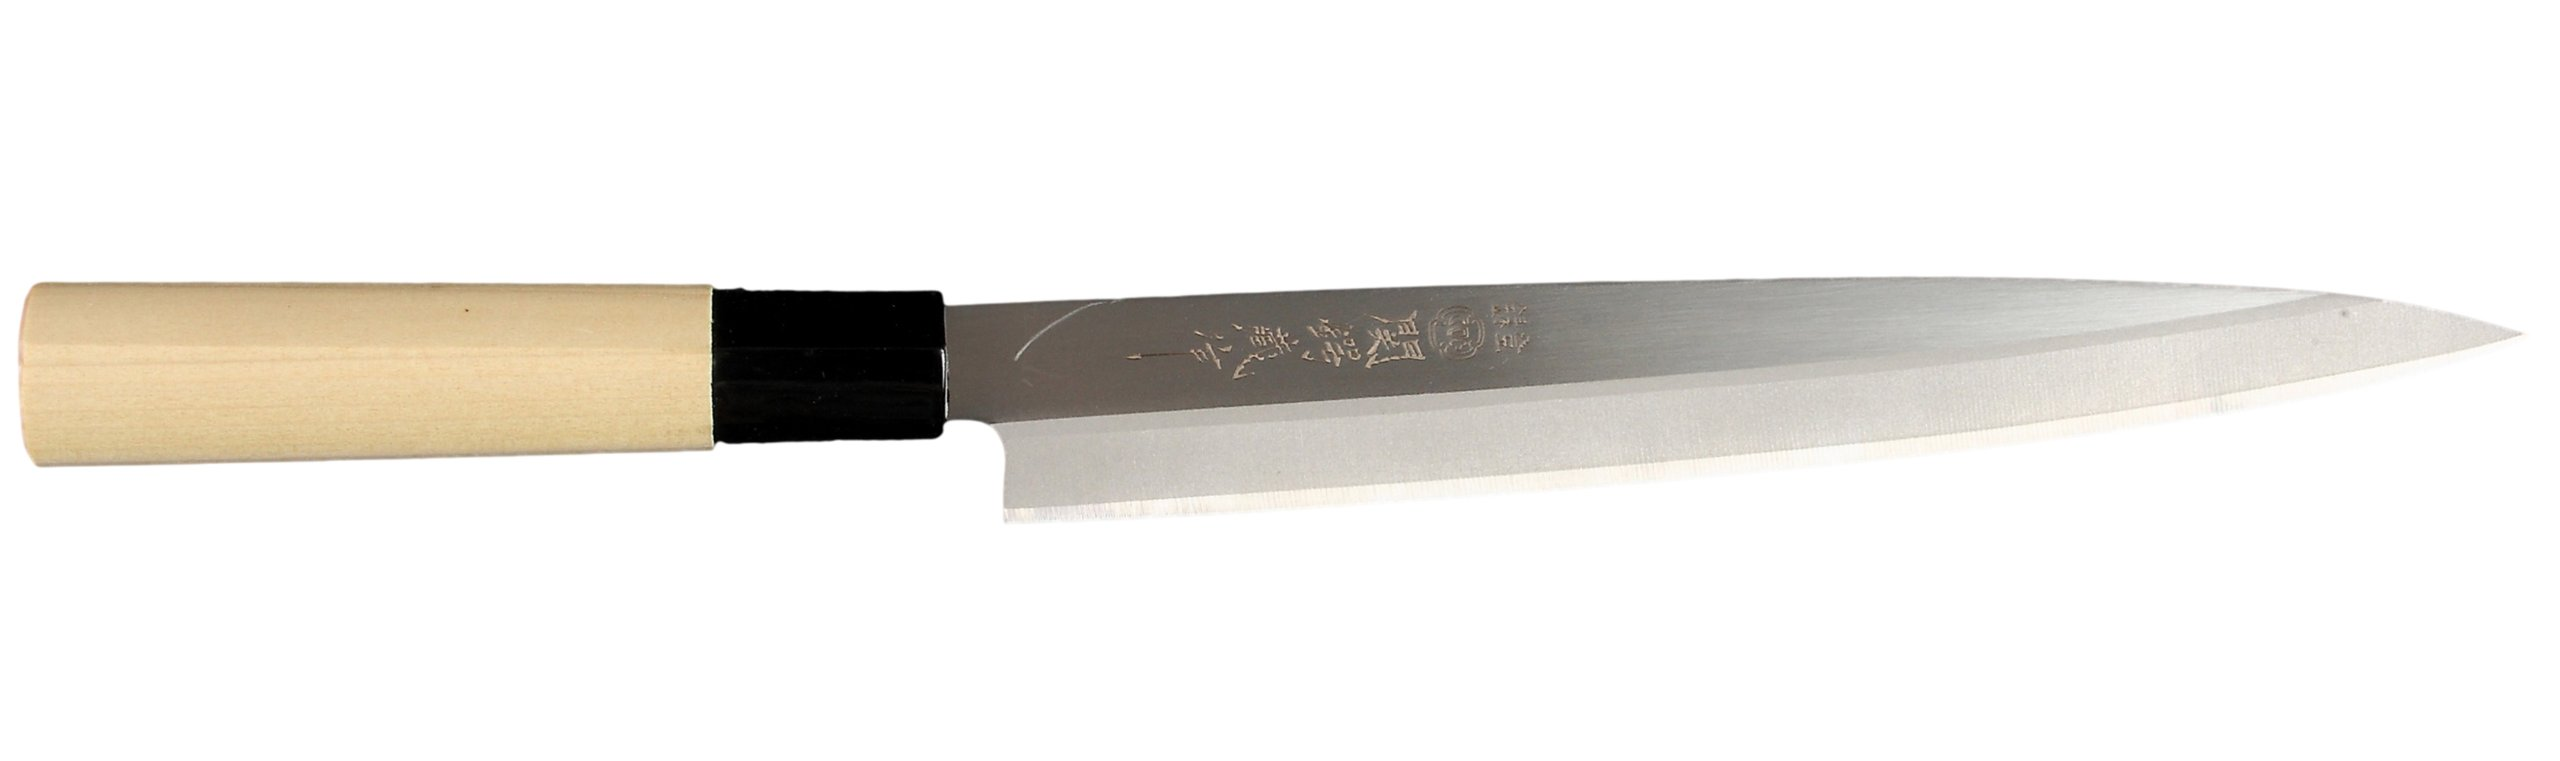 Ozawa Japanese Kithchen Knive (12-5/8'' Long - SASHIMI)